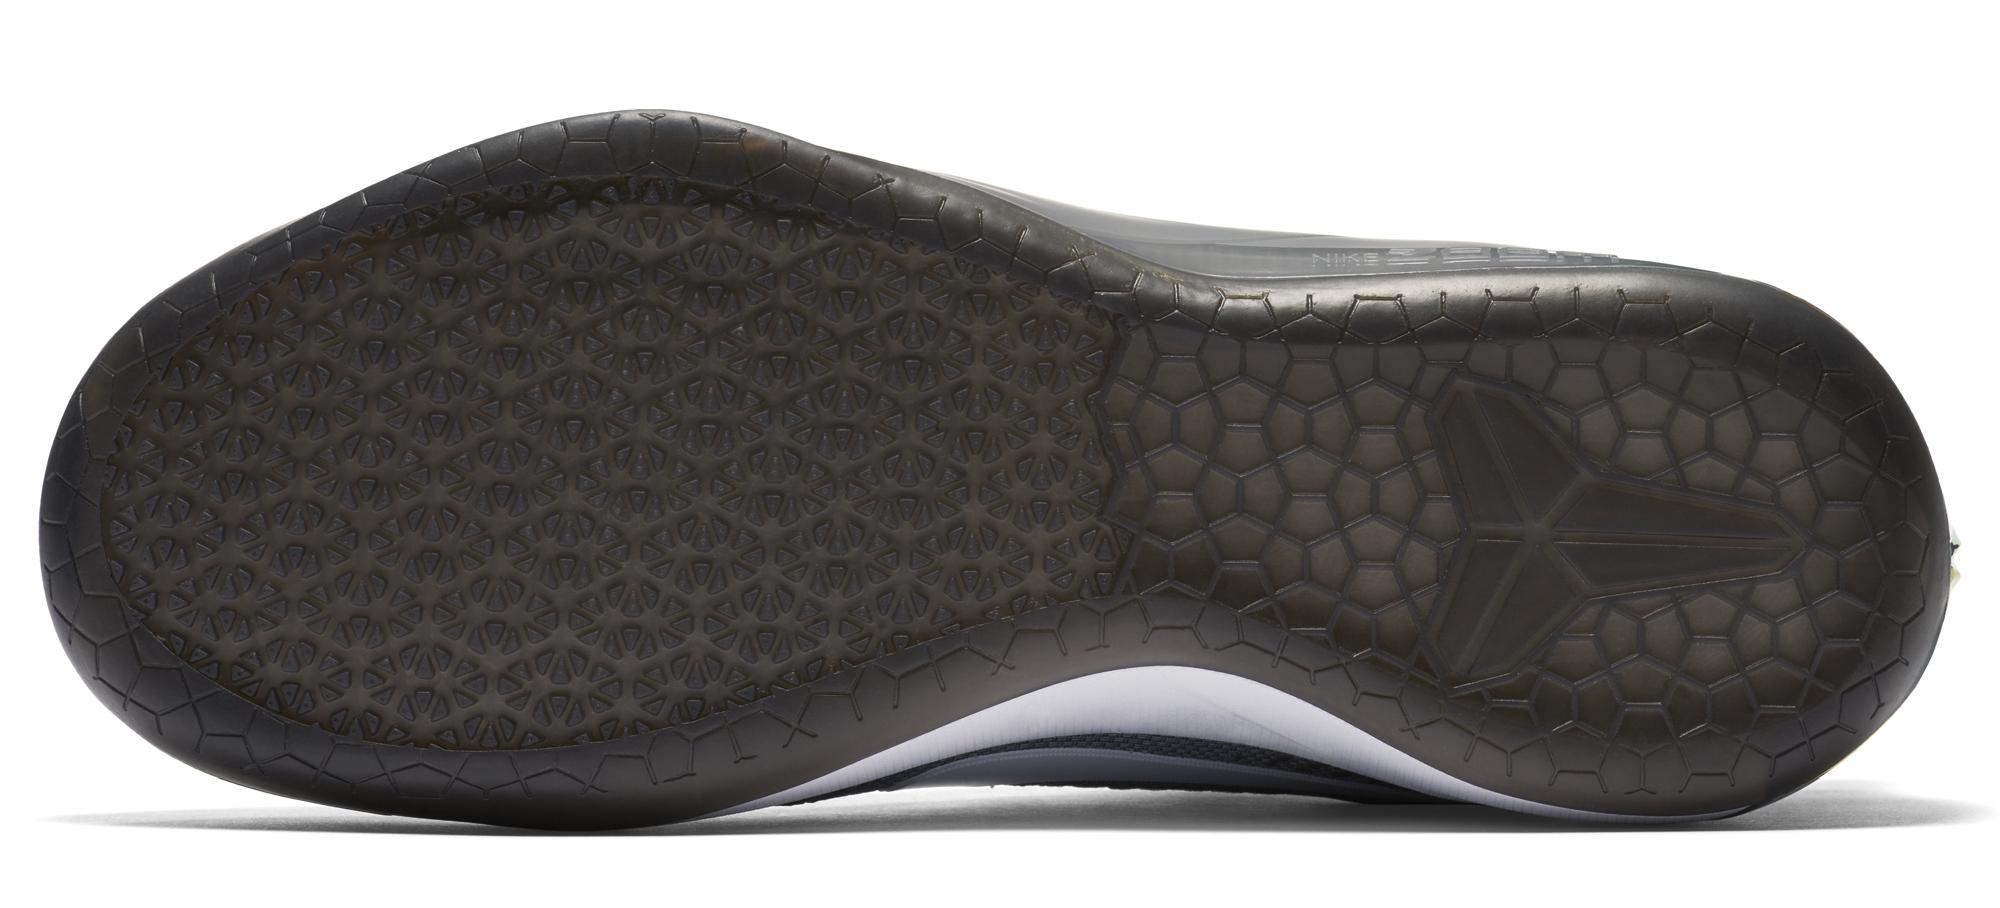 Nike Kobe AD Grey White | Sole Collector